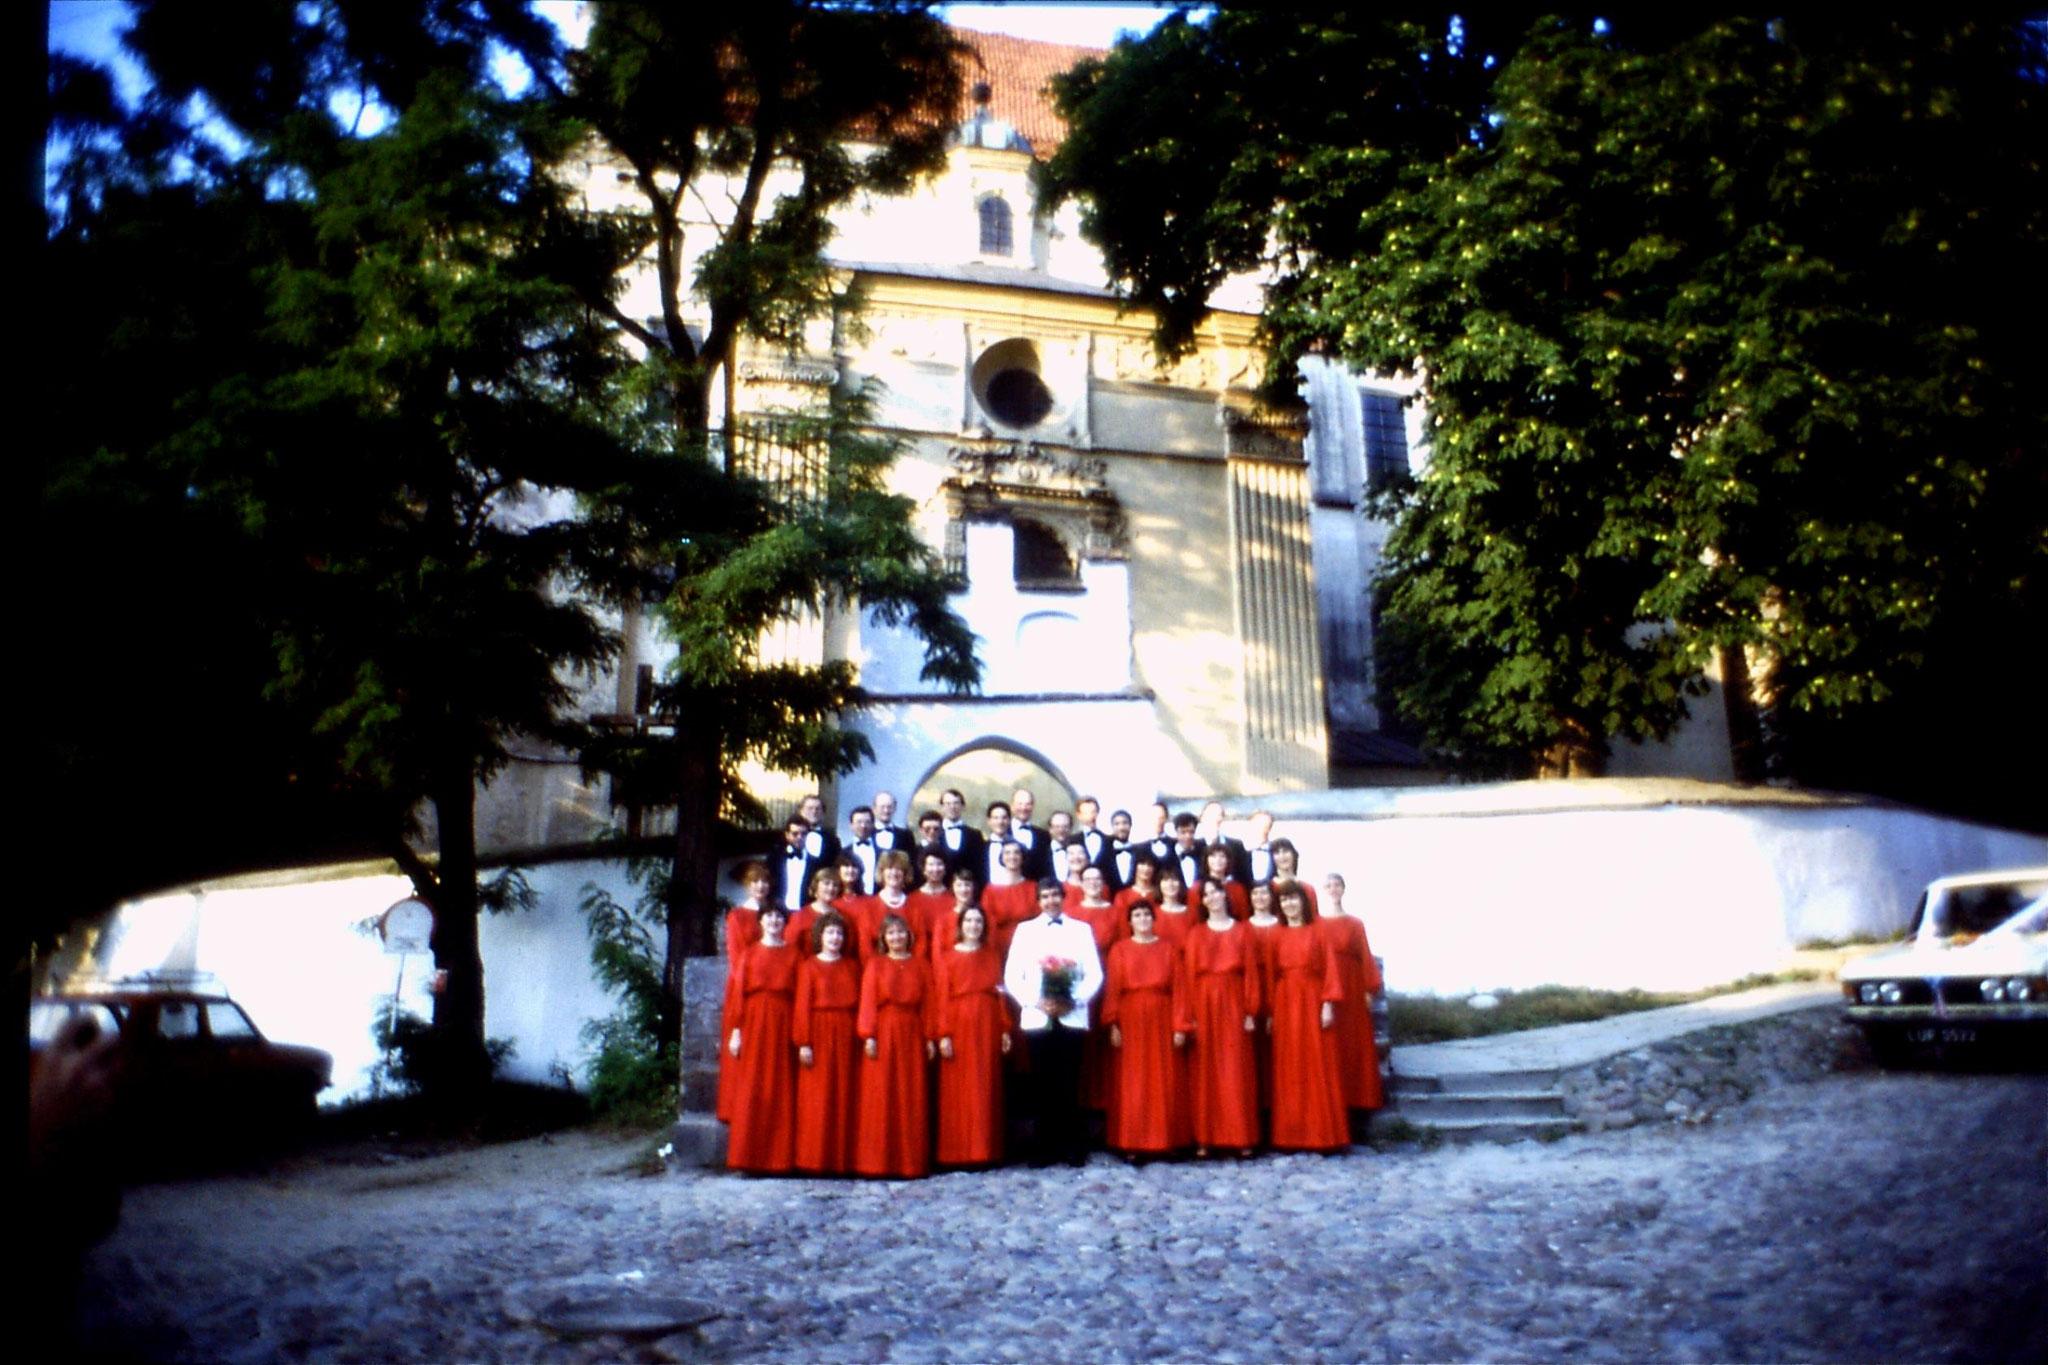 27/8/1988: 10: London Chorale at Kazimierz Dolny